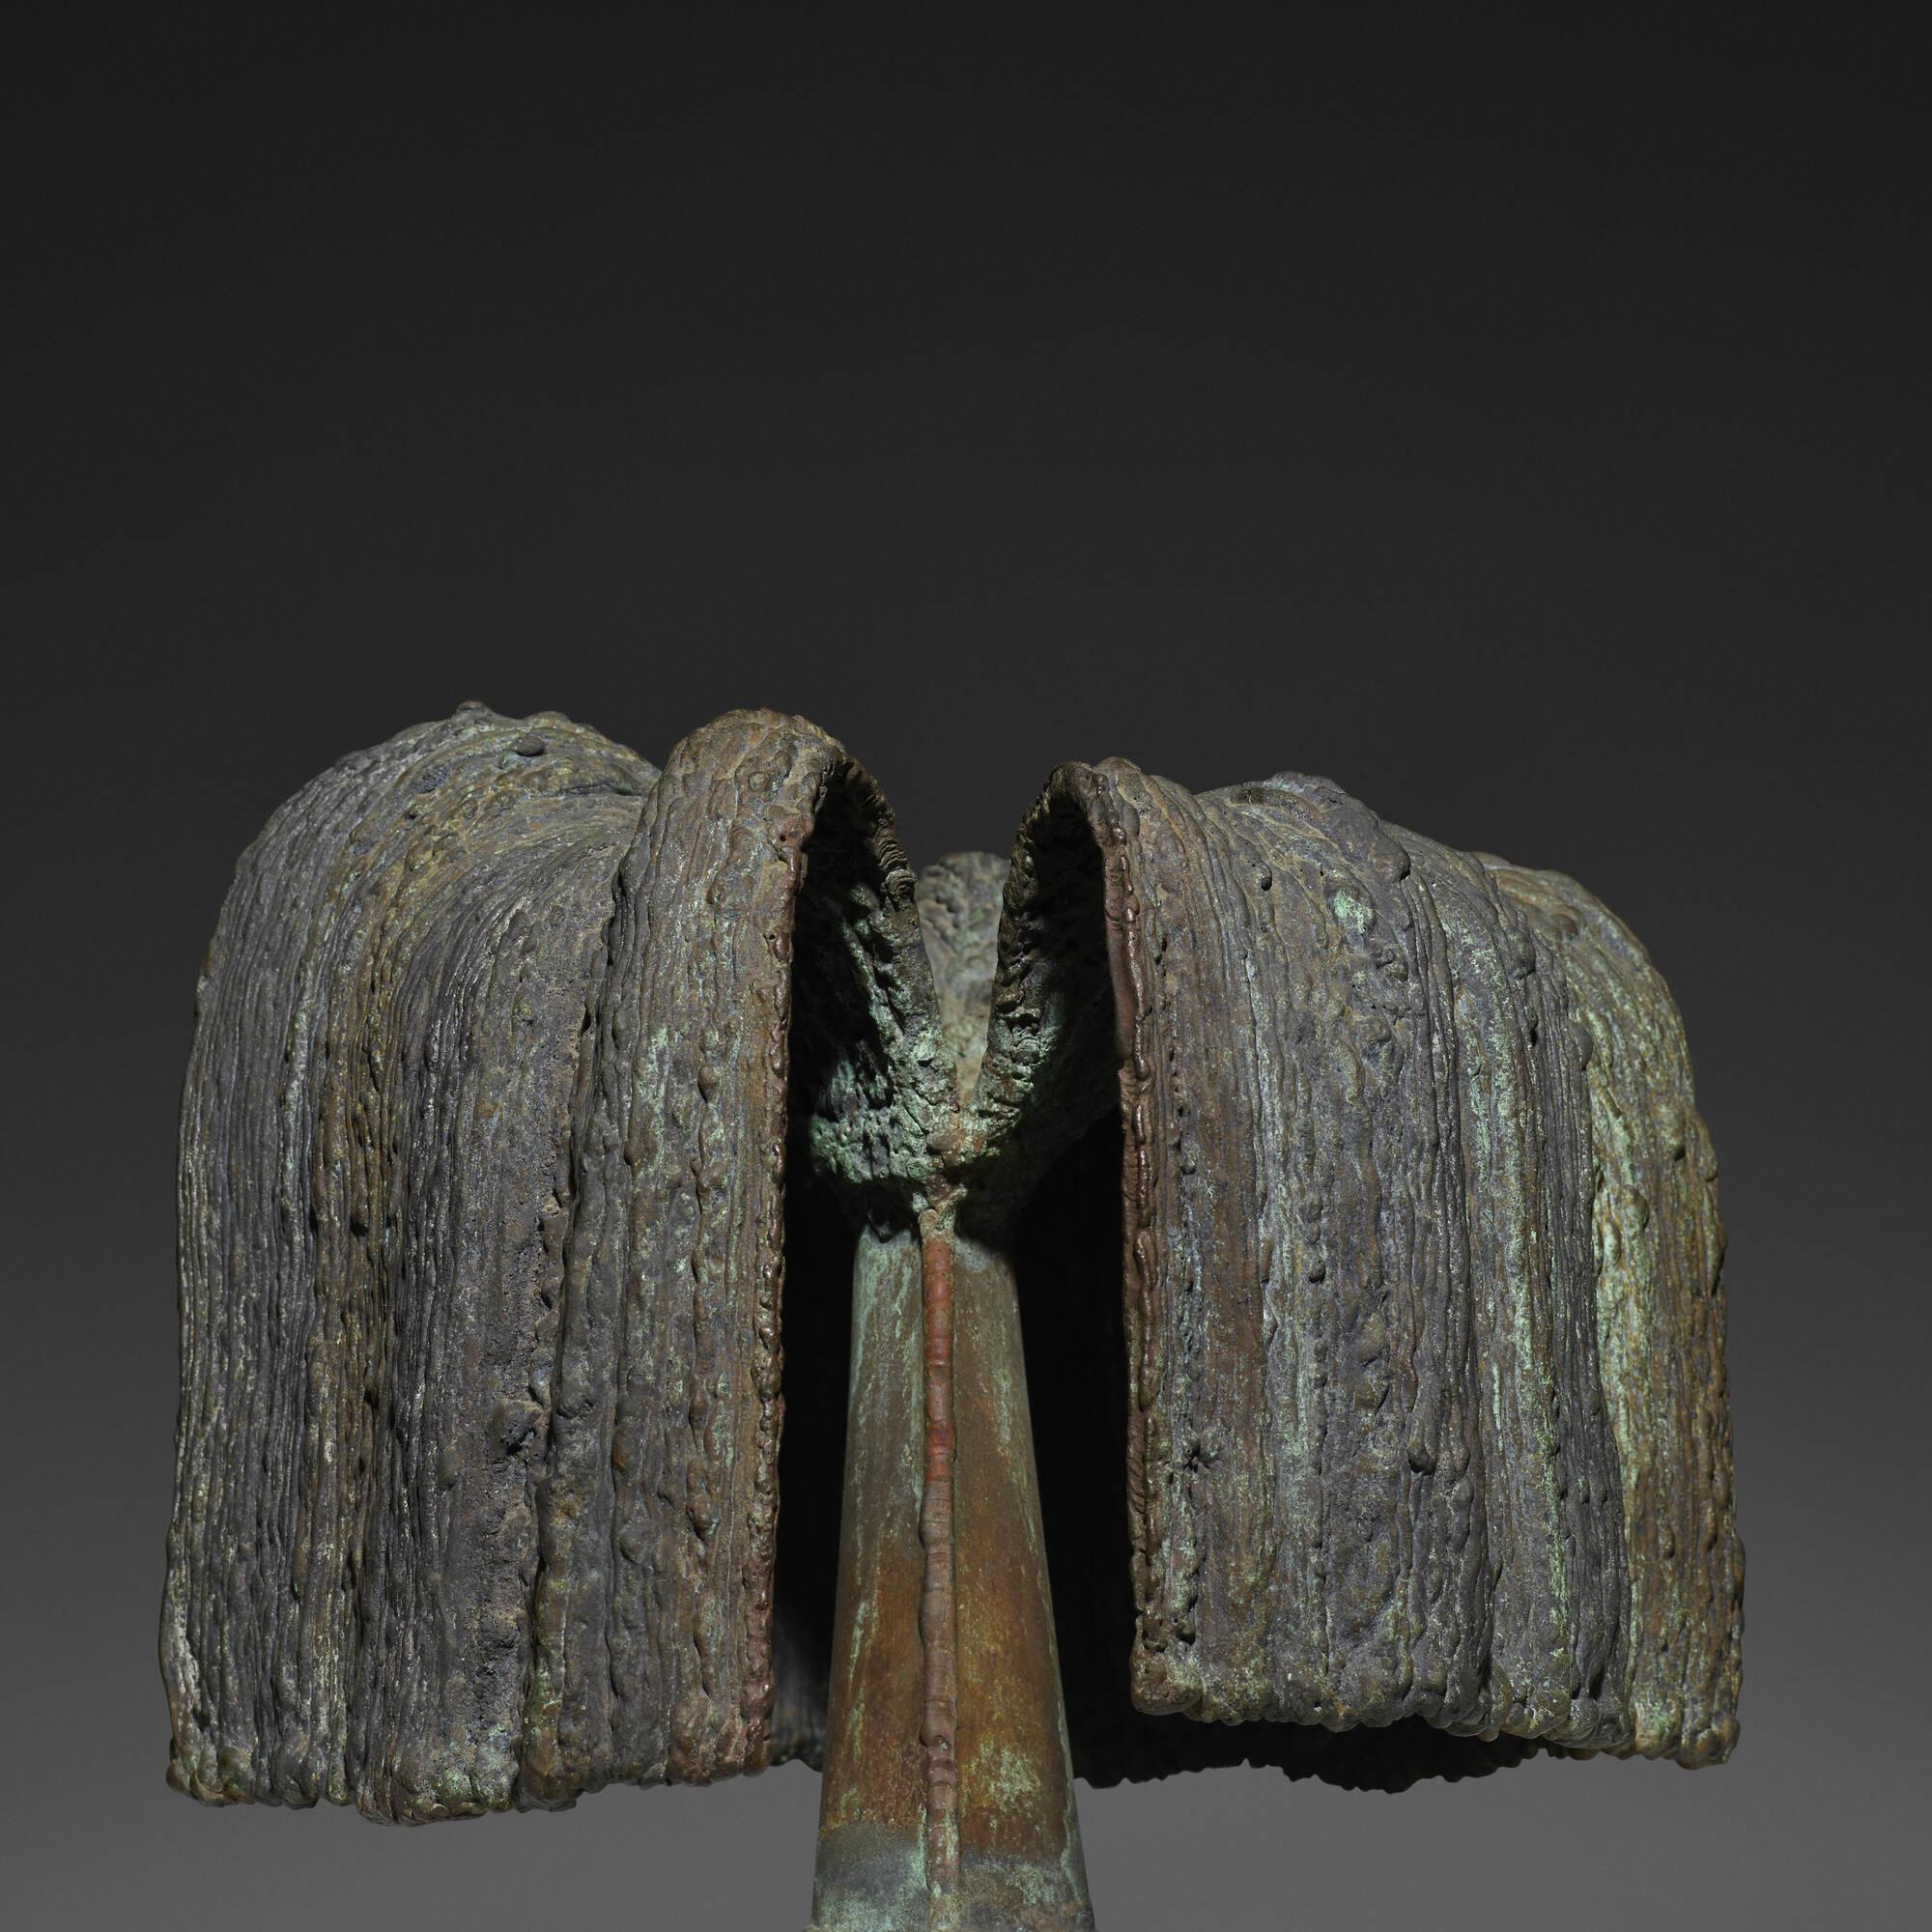 188: Harry Bertoia / Untitled (Welded Form) (3 of 4)